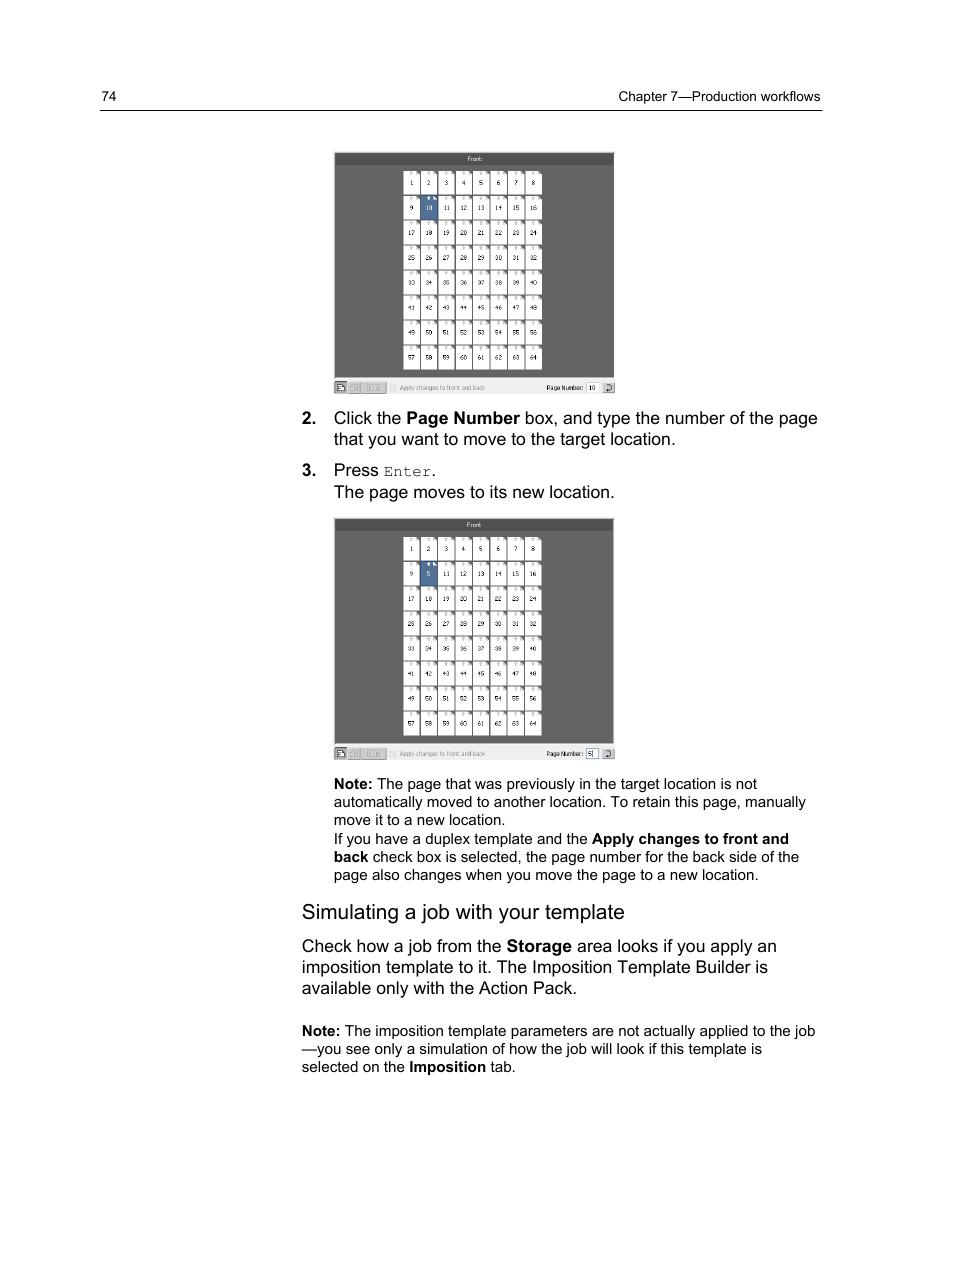 Simulating A Job With Your Template Konica Minolta Bizhub Press 1250 User Manual Page